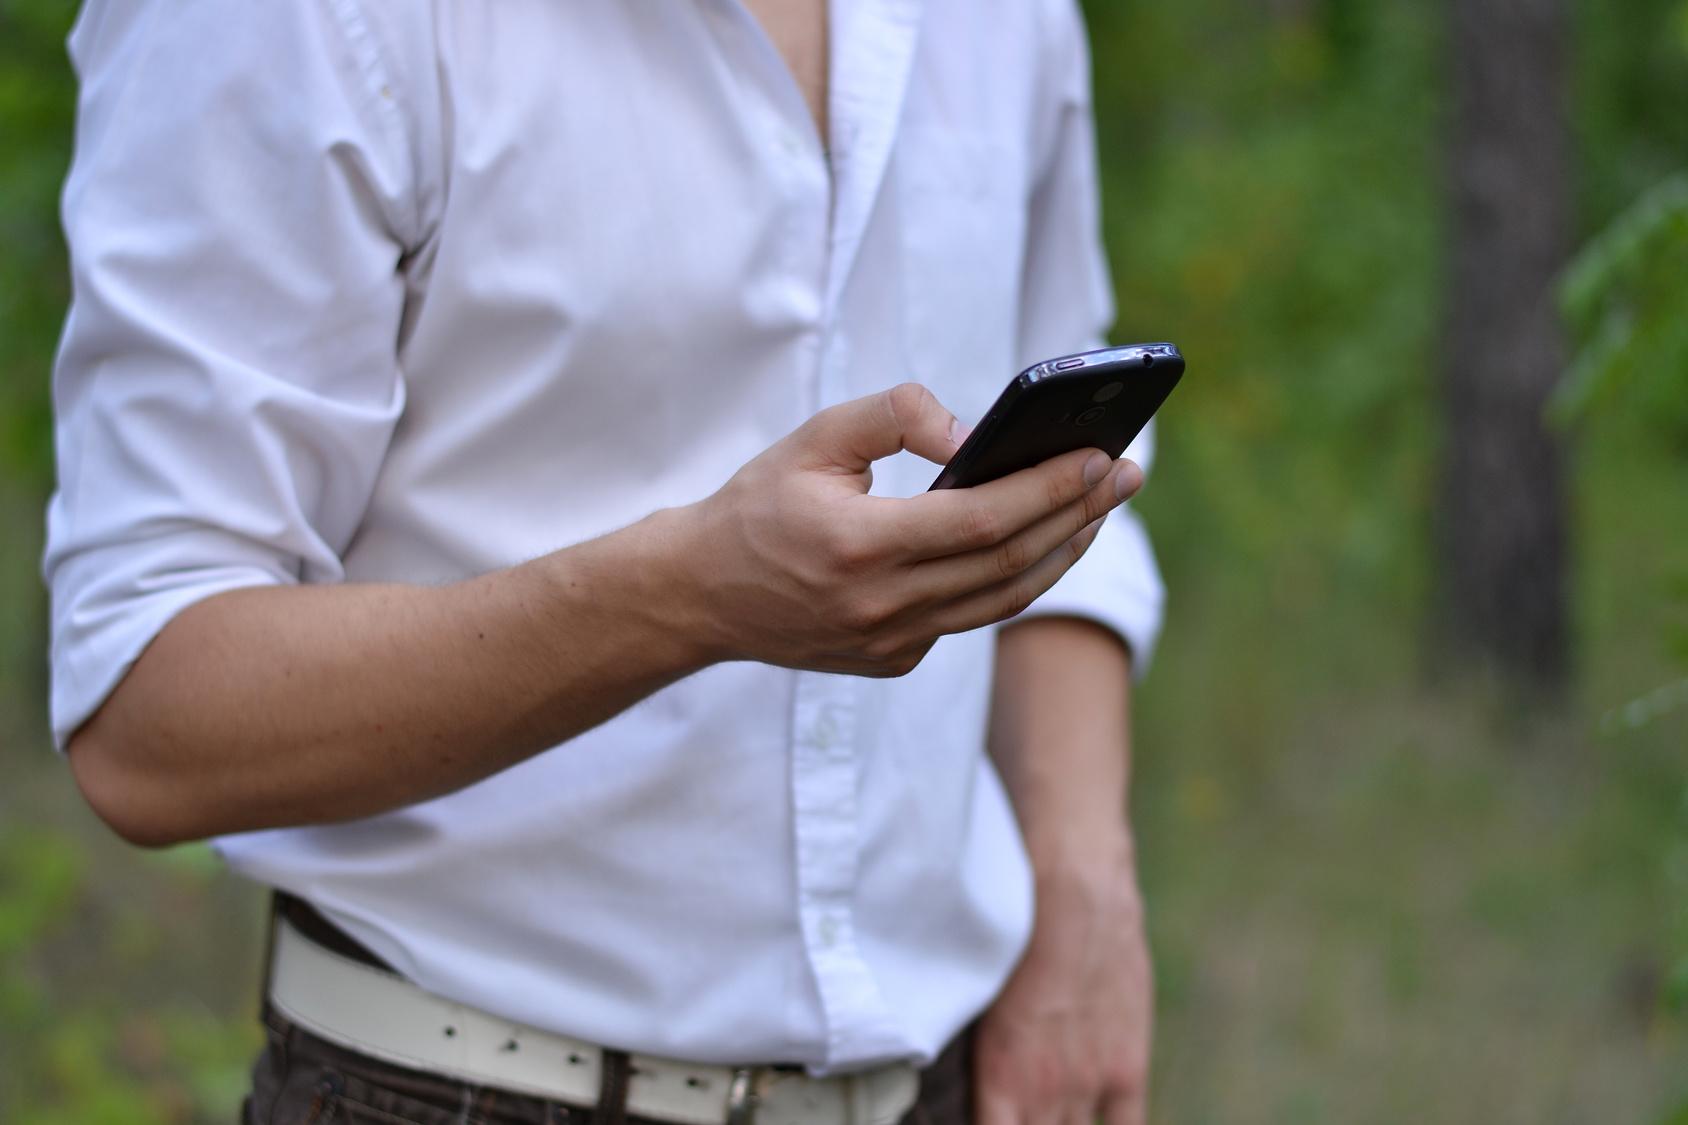 4G coverage boost across region